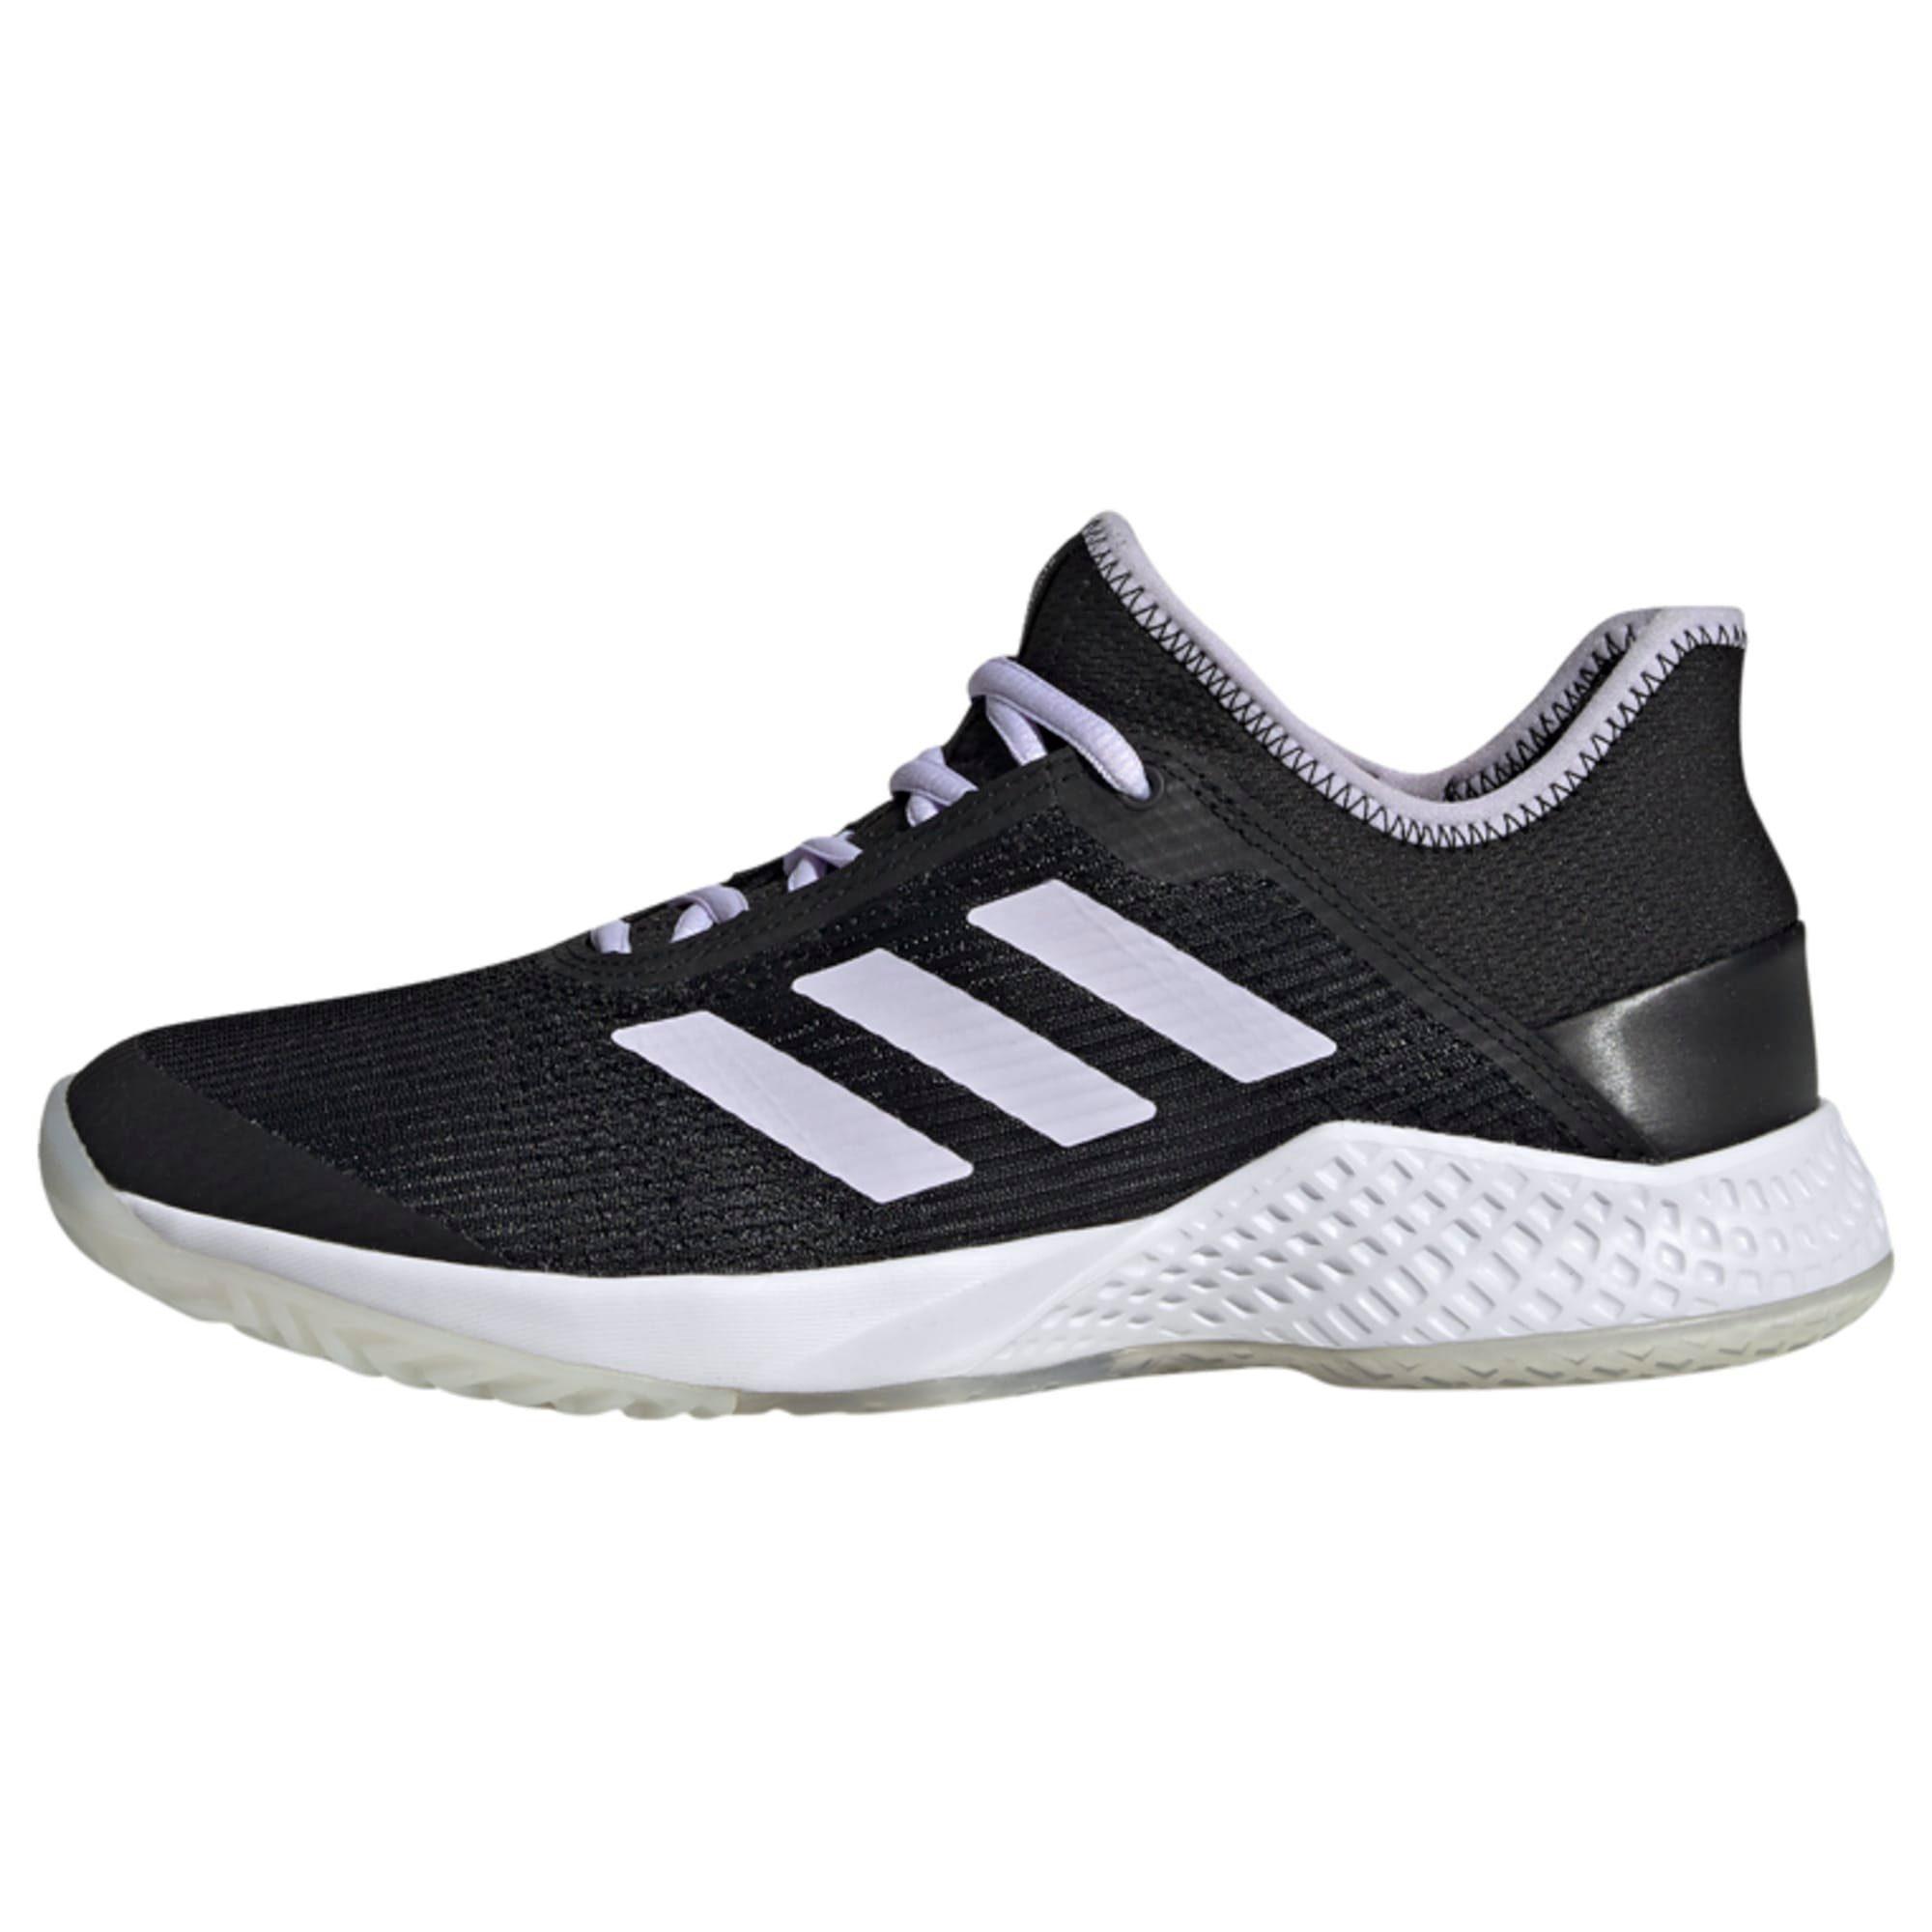 adidas Performance »Adizero Club Schuh« Laufschuh adizero online kaufen   OTTO